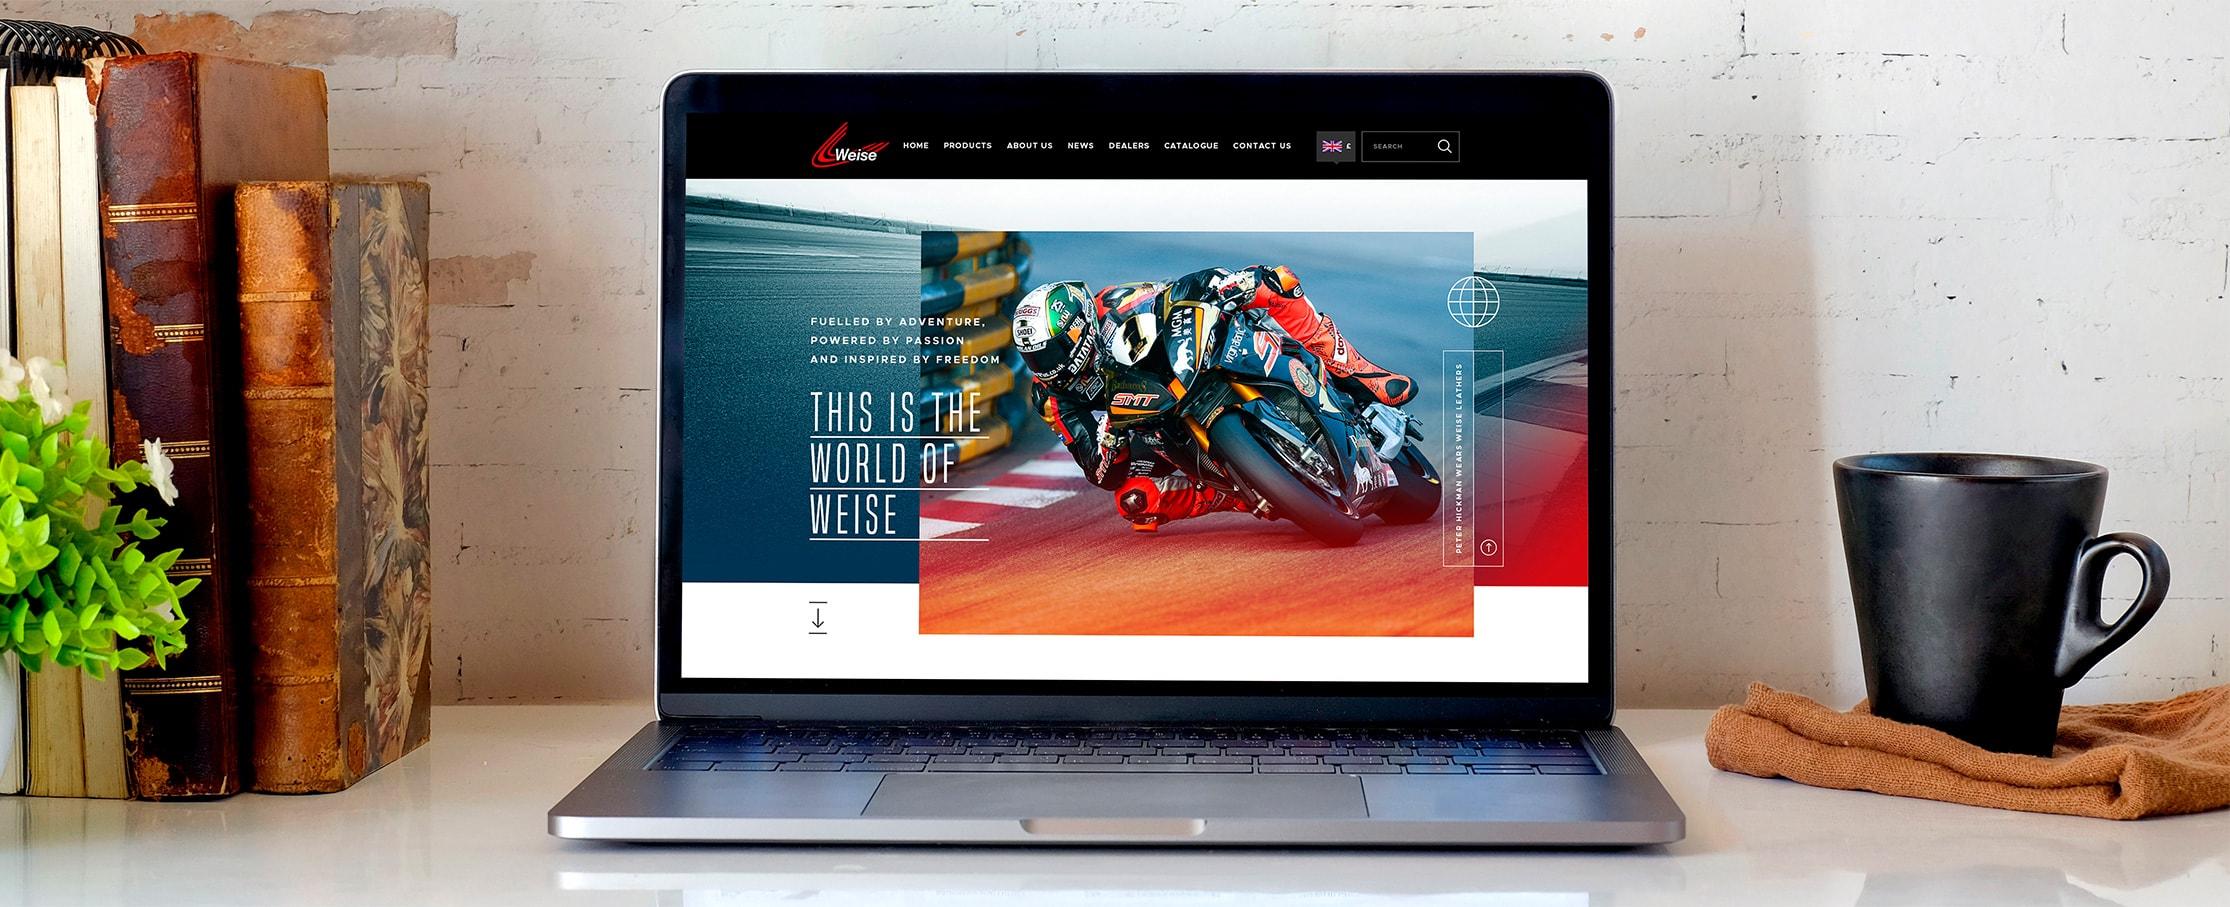 Motorcycle dealer website design Weise